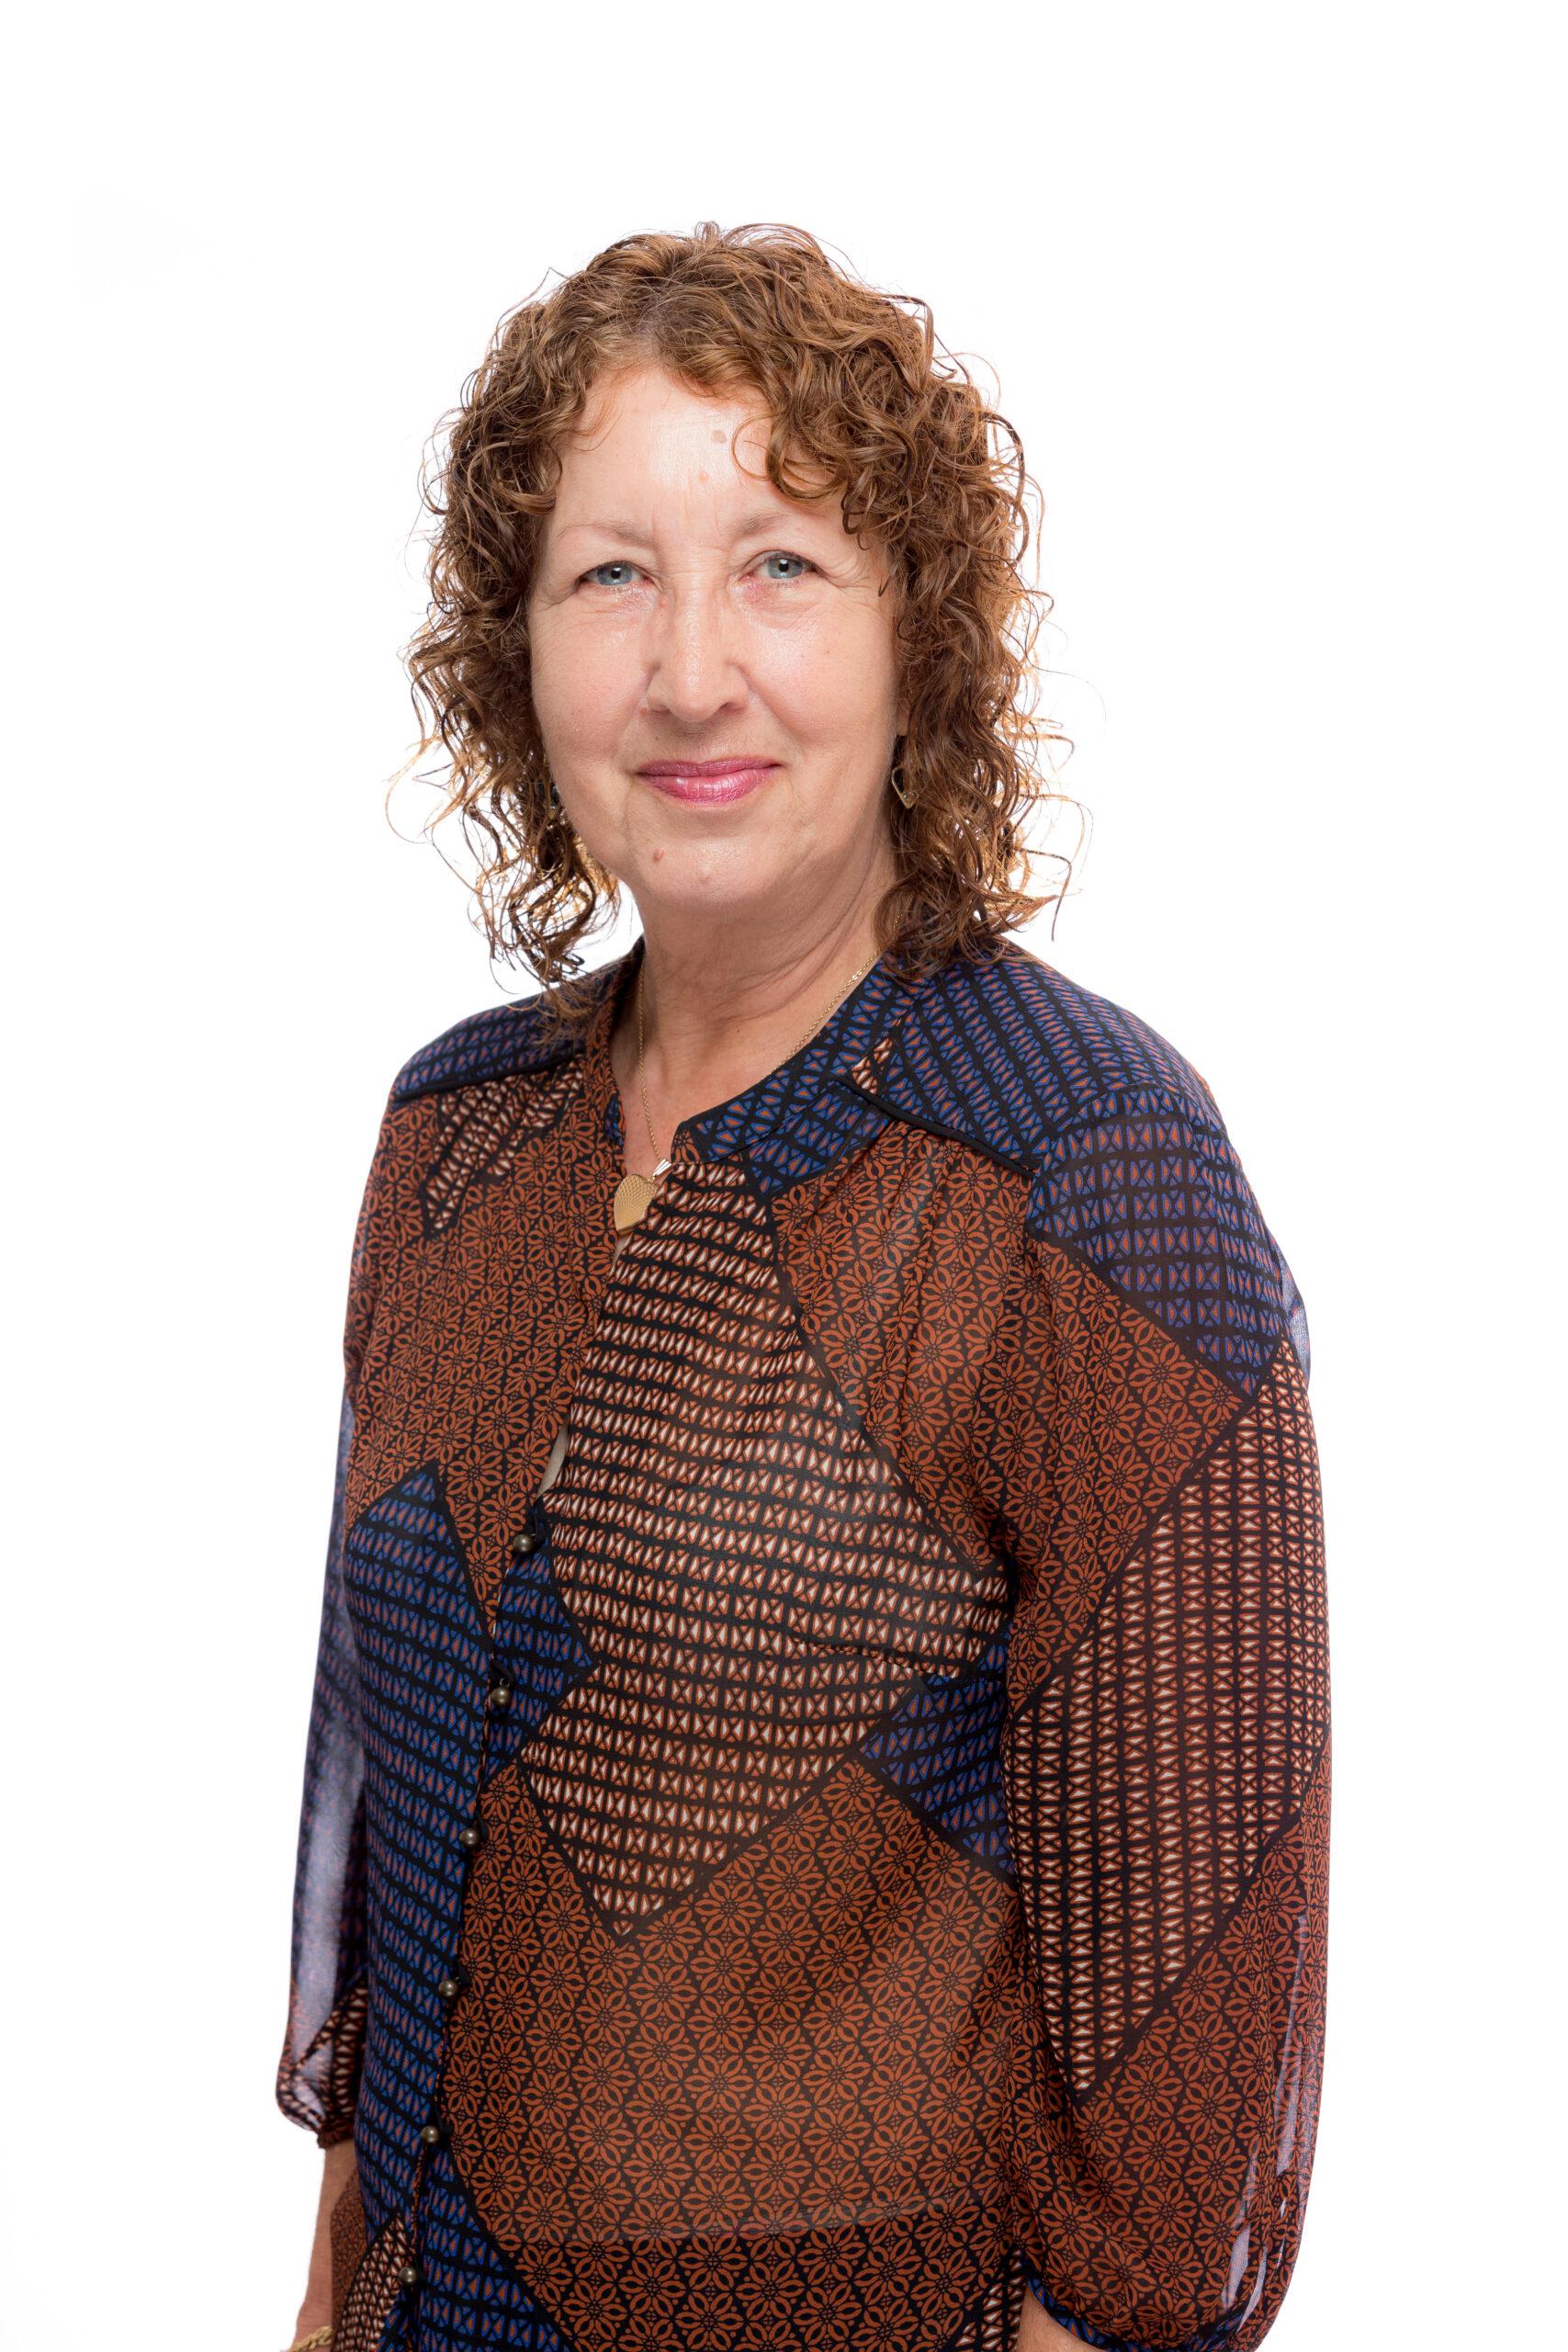 Mrs S Wilkins